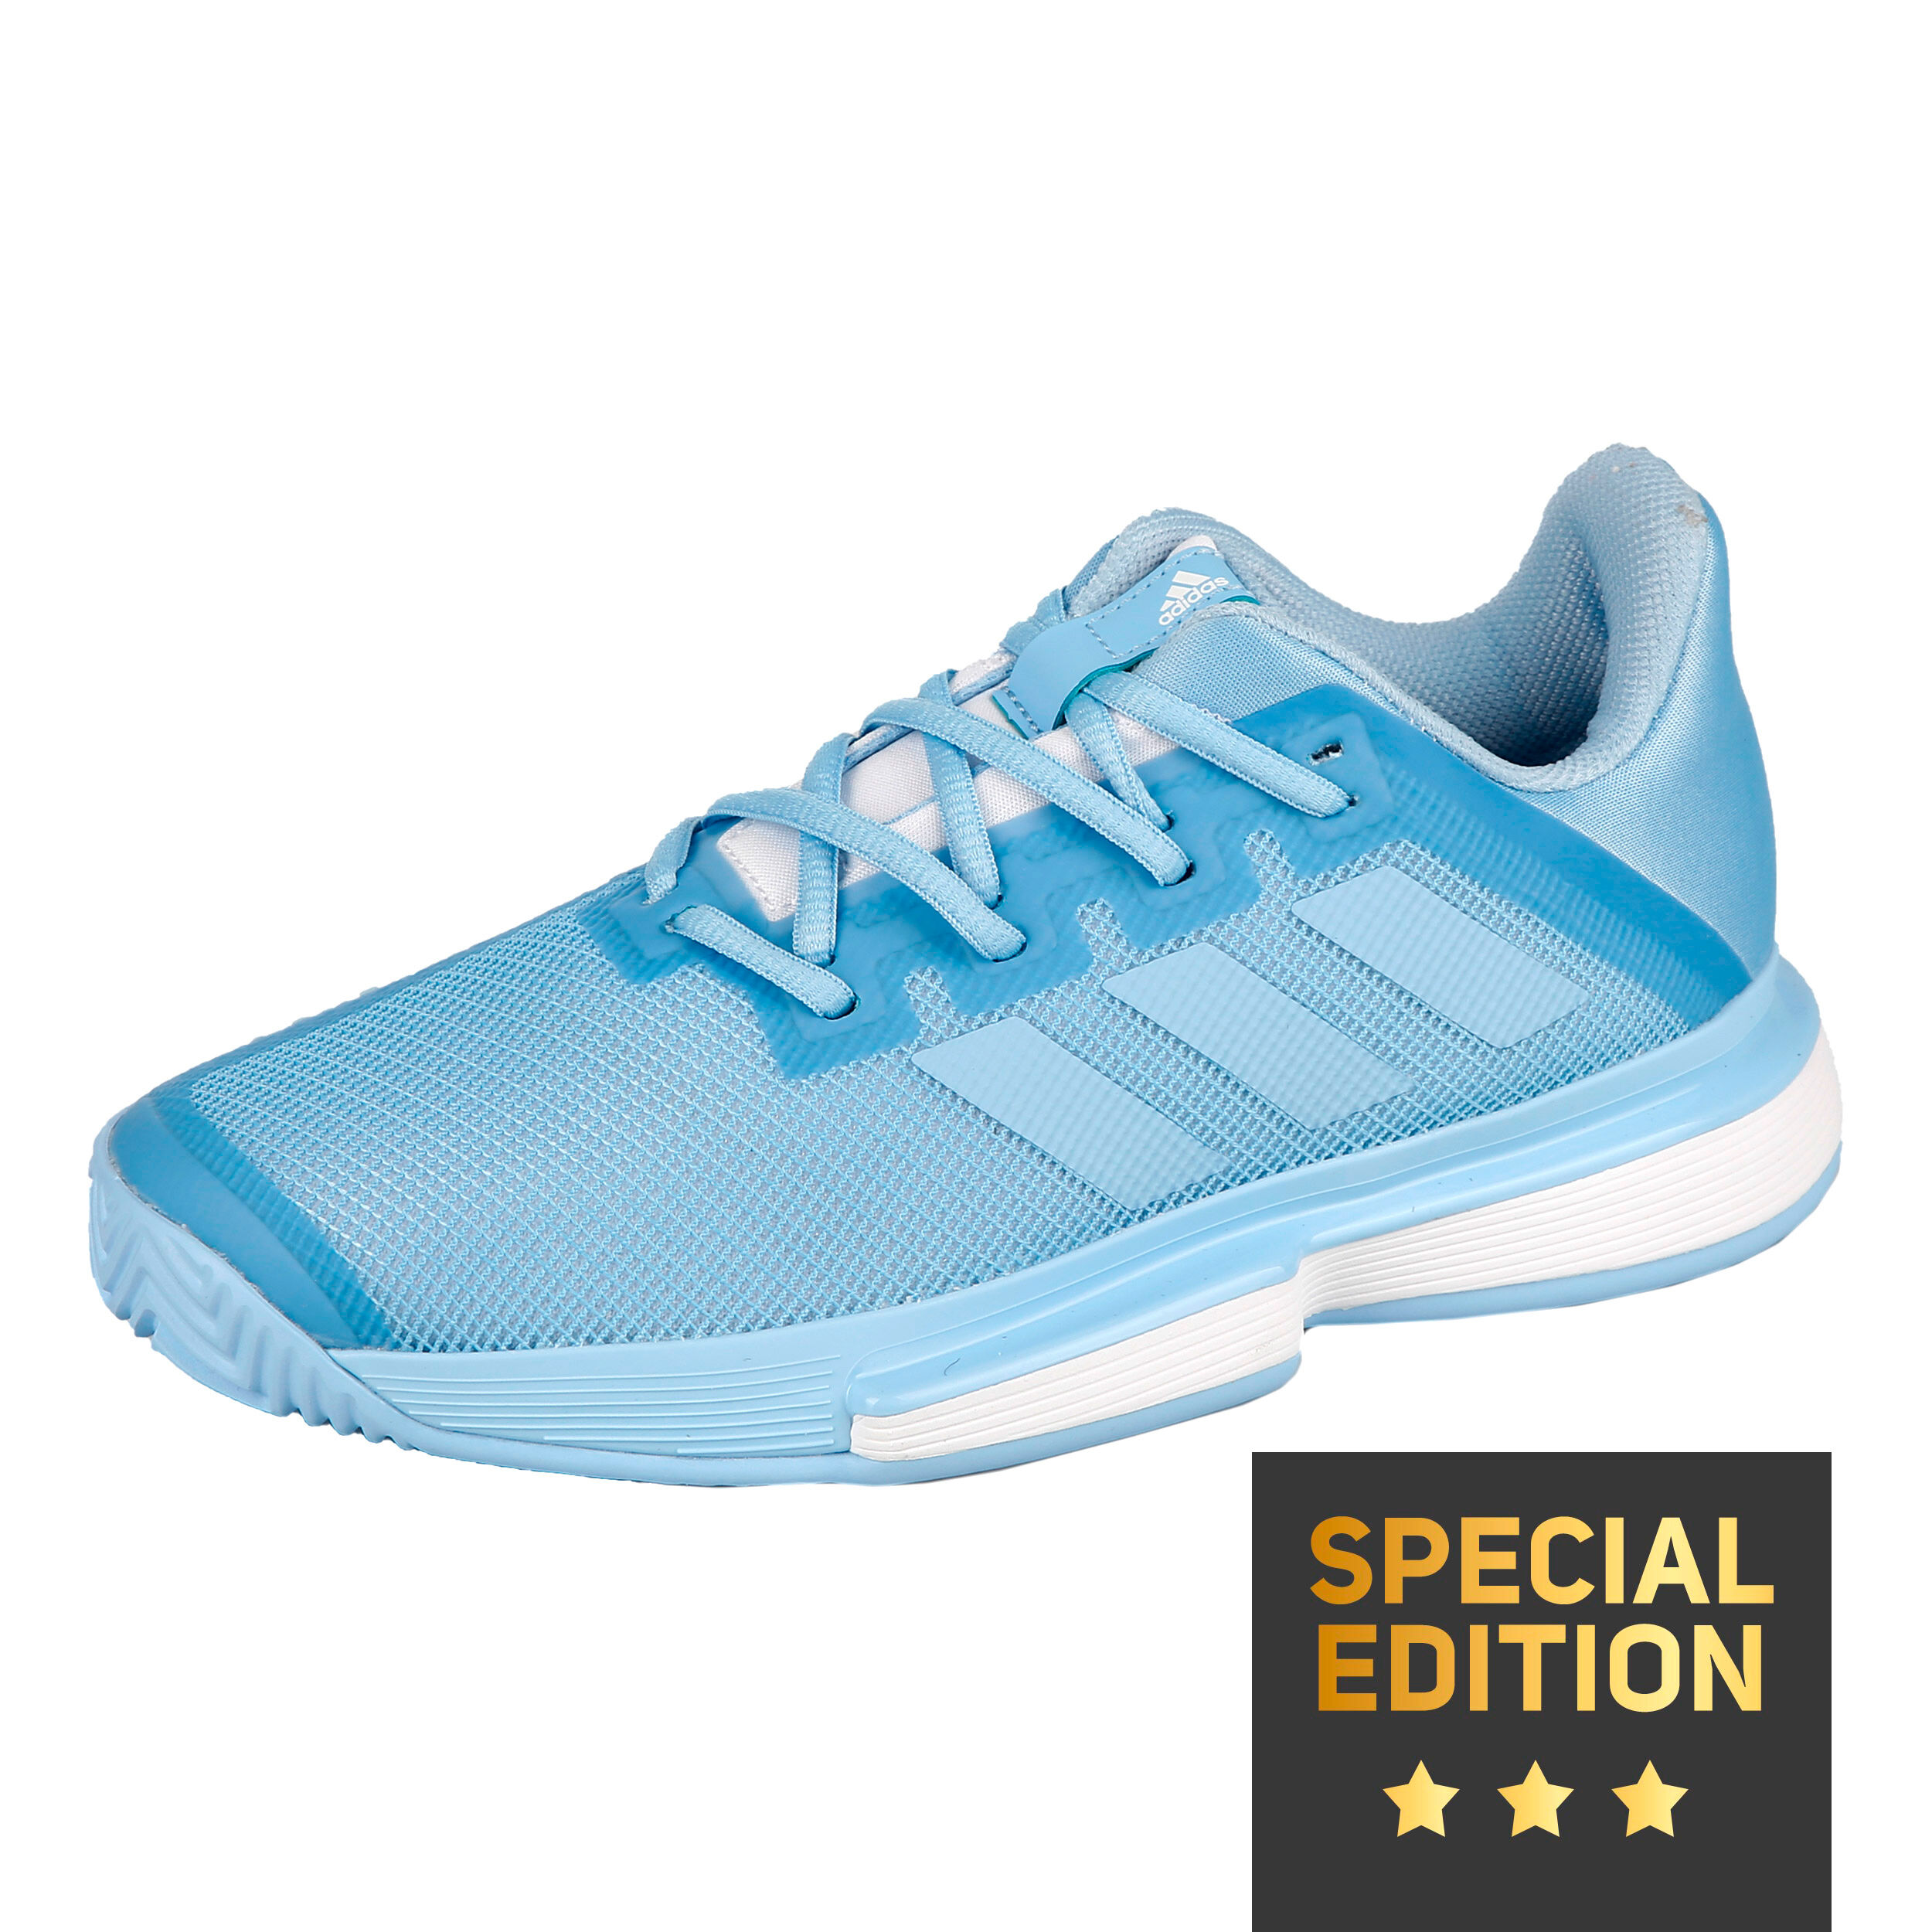 Special Bounce Edition adidas Match Sandplatzschuh Clay Sole GzqUMpjLSV